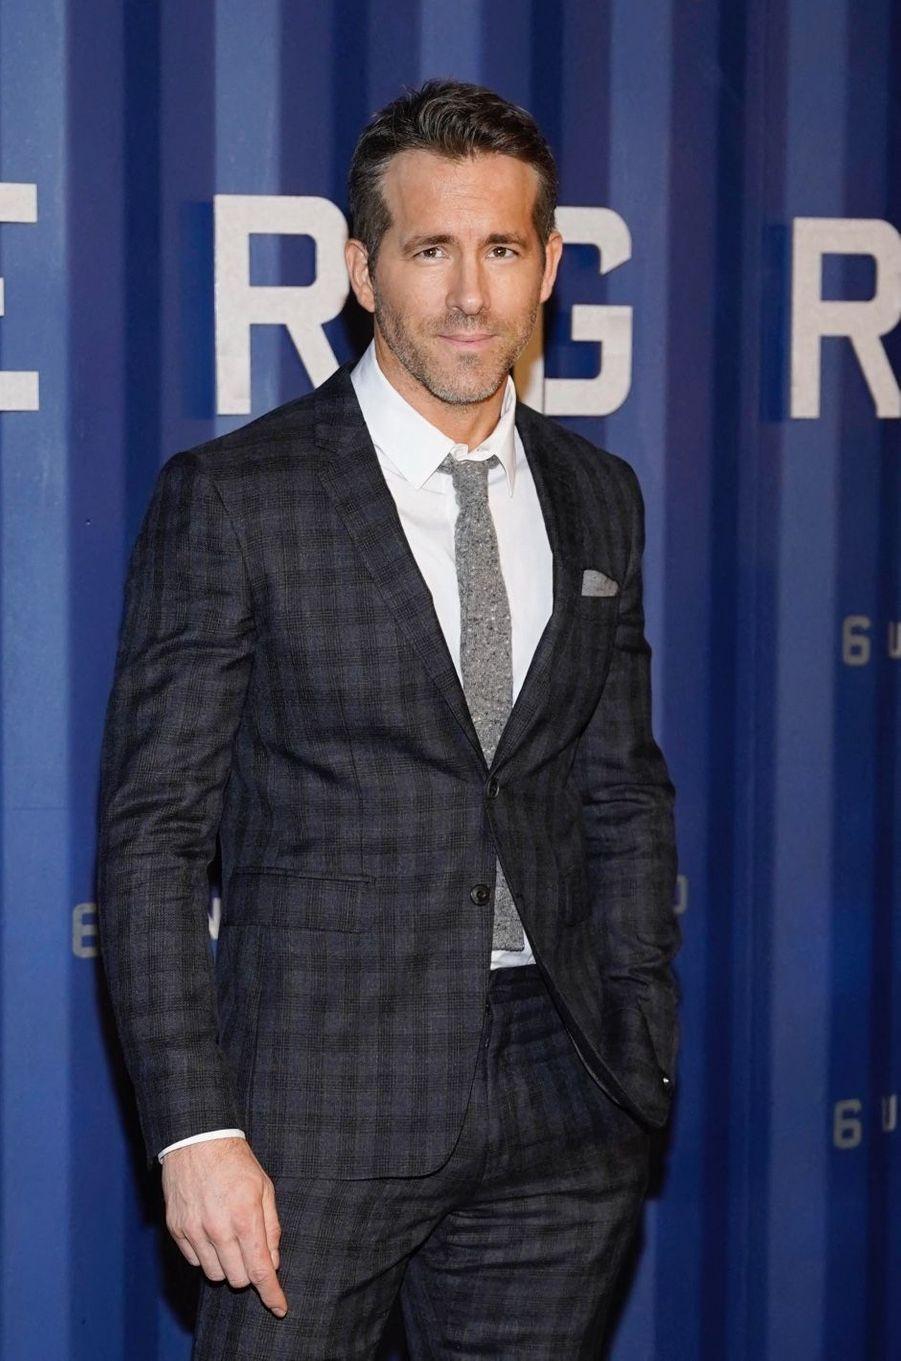 18 - Ryan Reynolds, 71,5 millions de dollars.